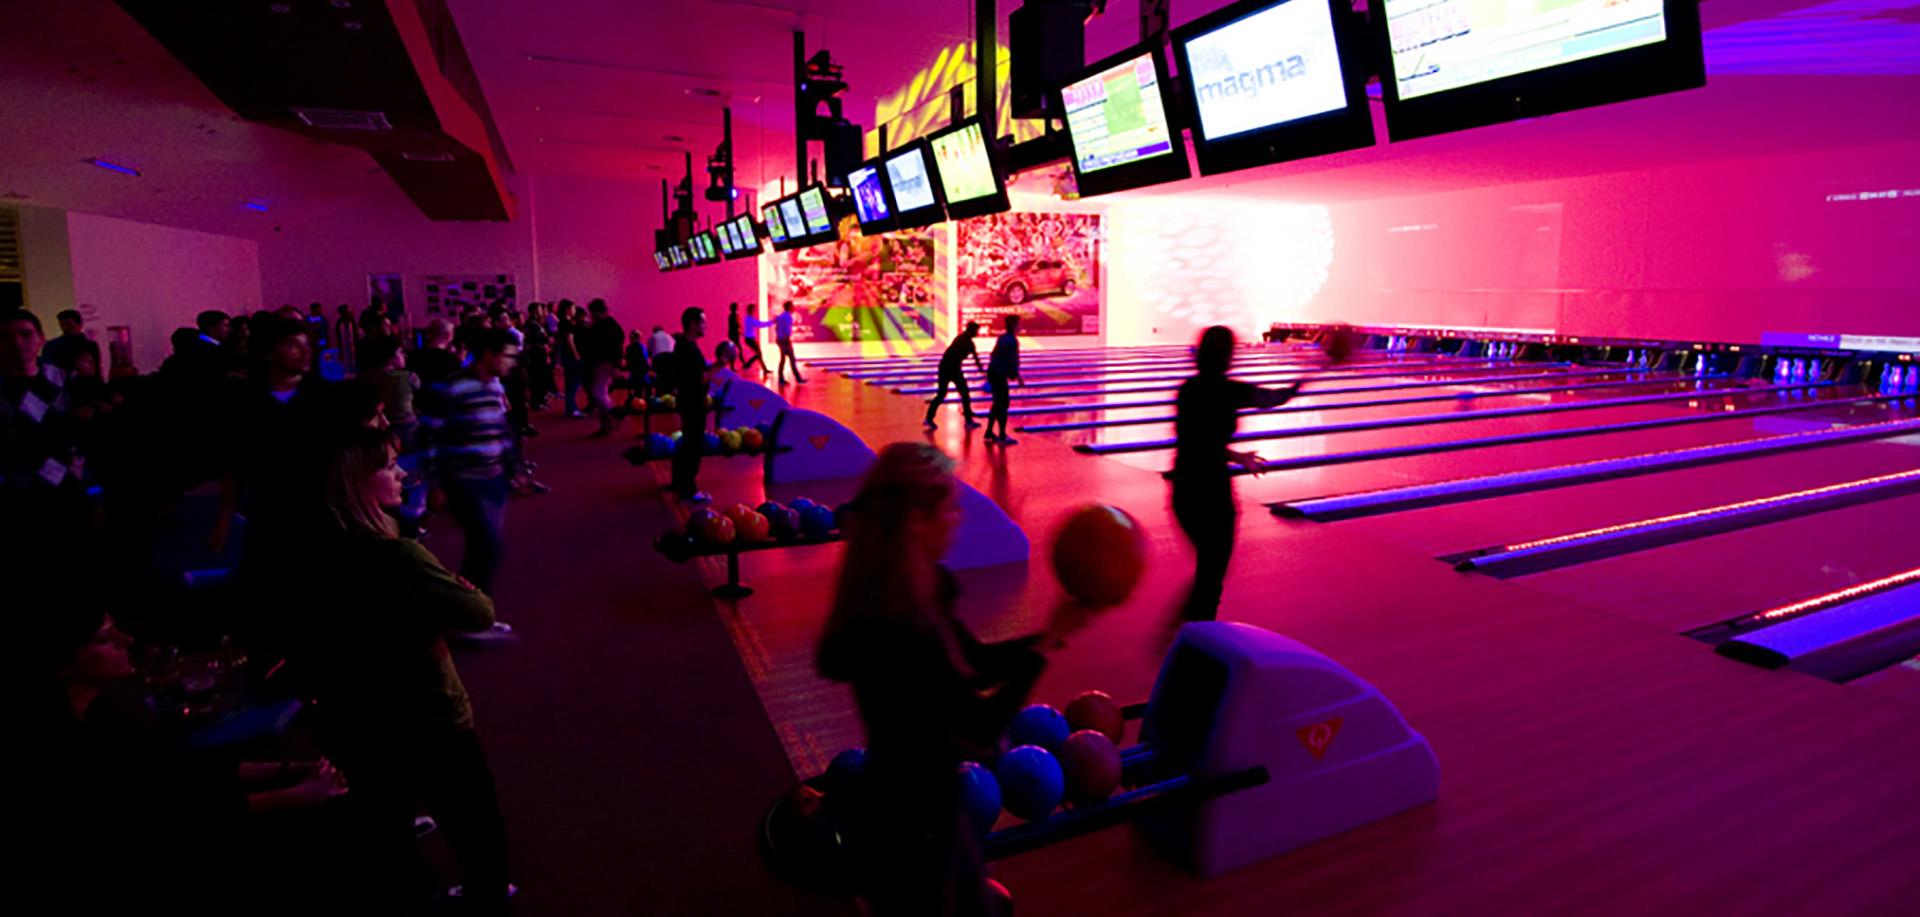 Slide bowling